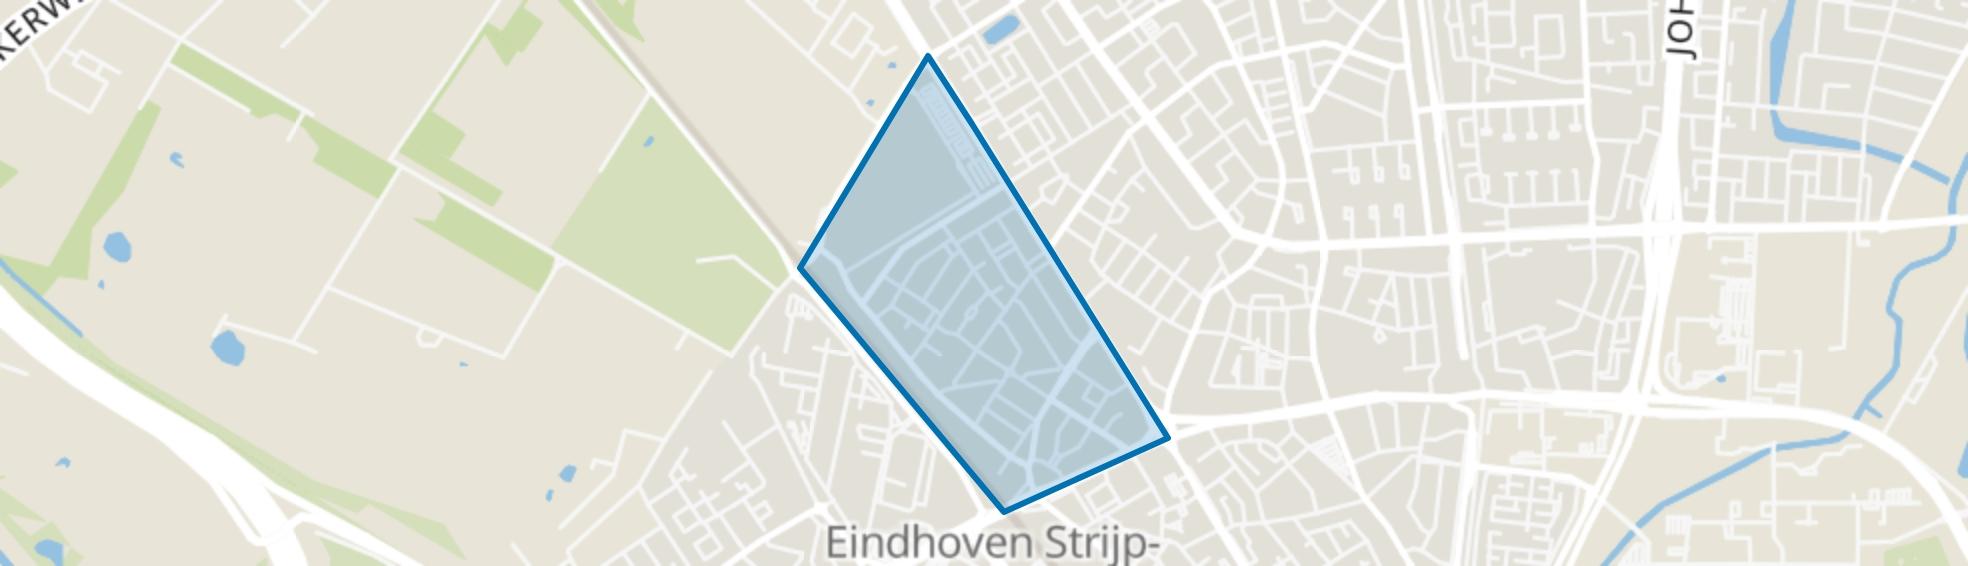 Woensel-West, Eindhoven map